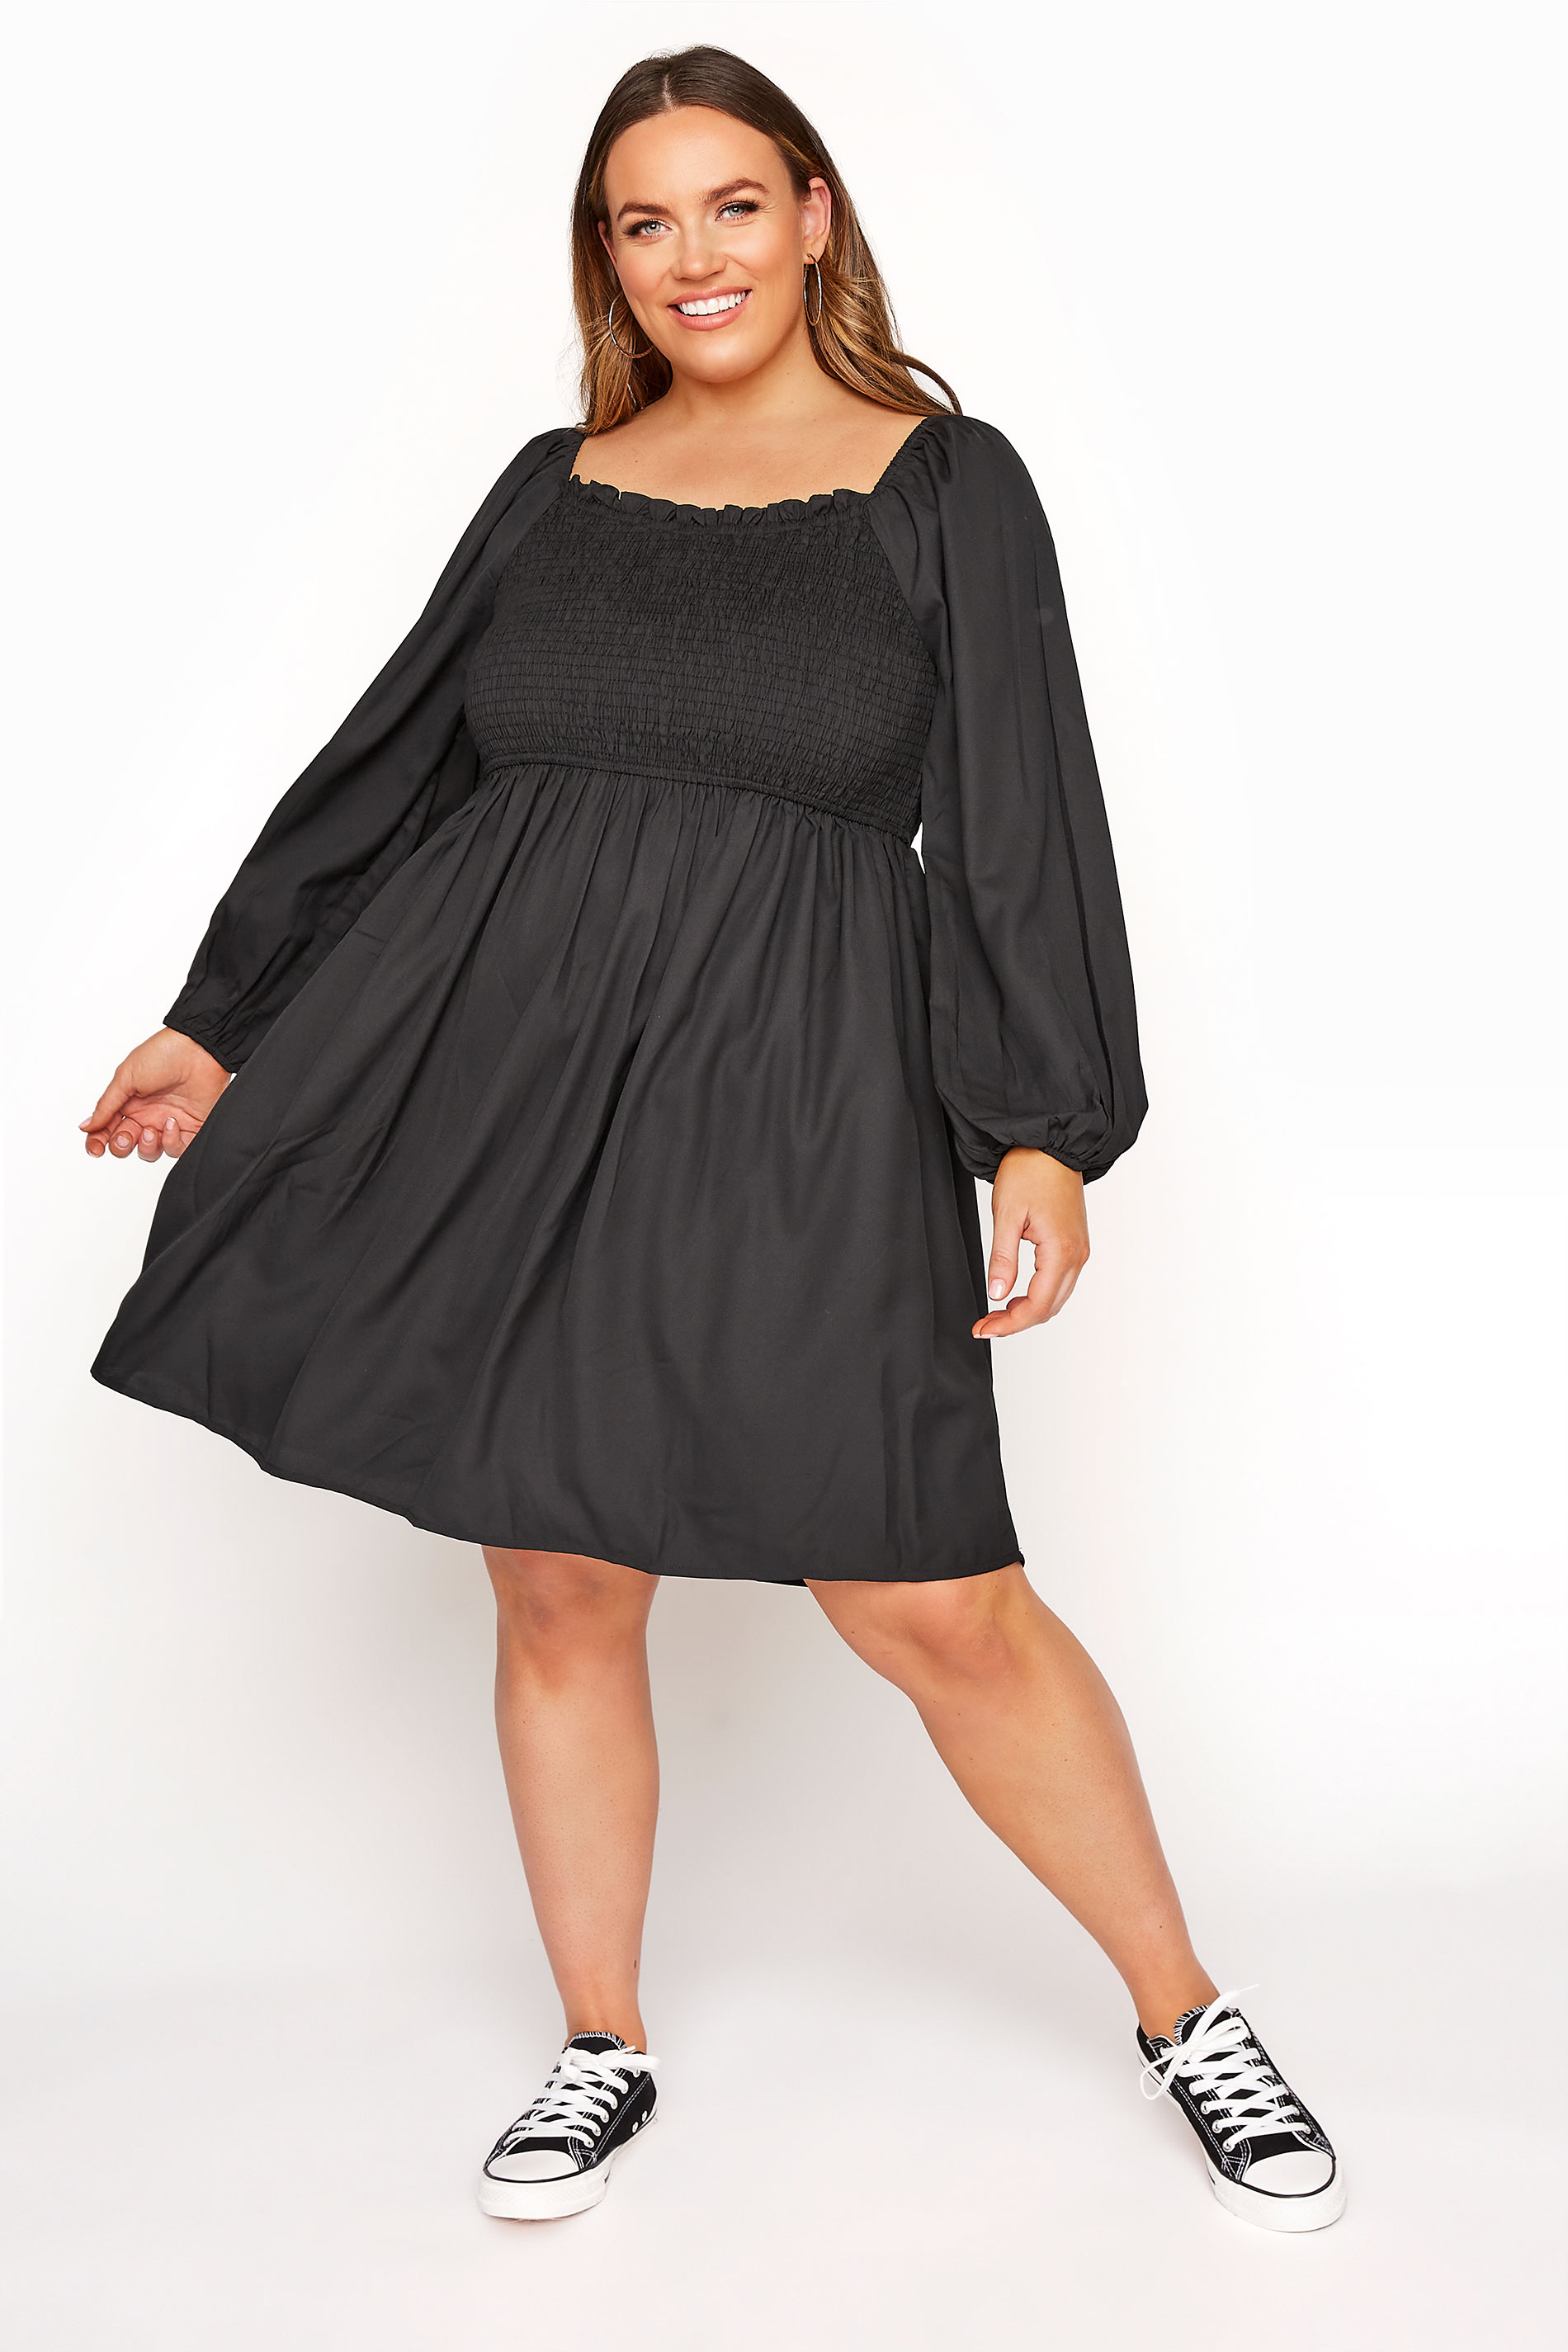 LIMITED COLLECTION Black Shirred Smock Dress